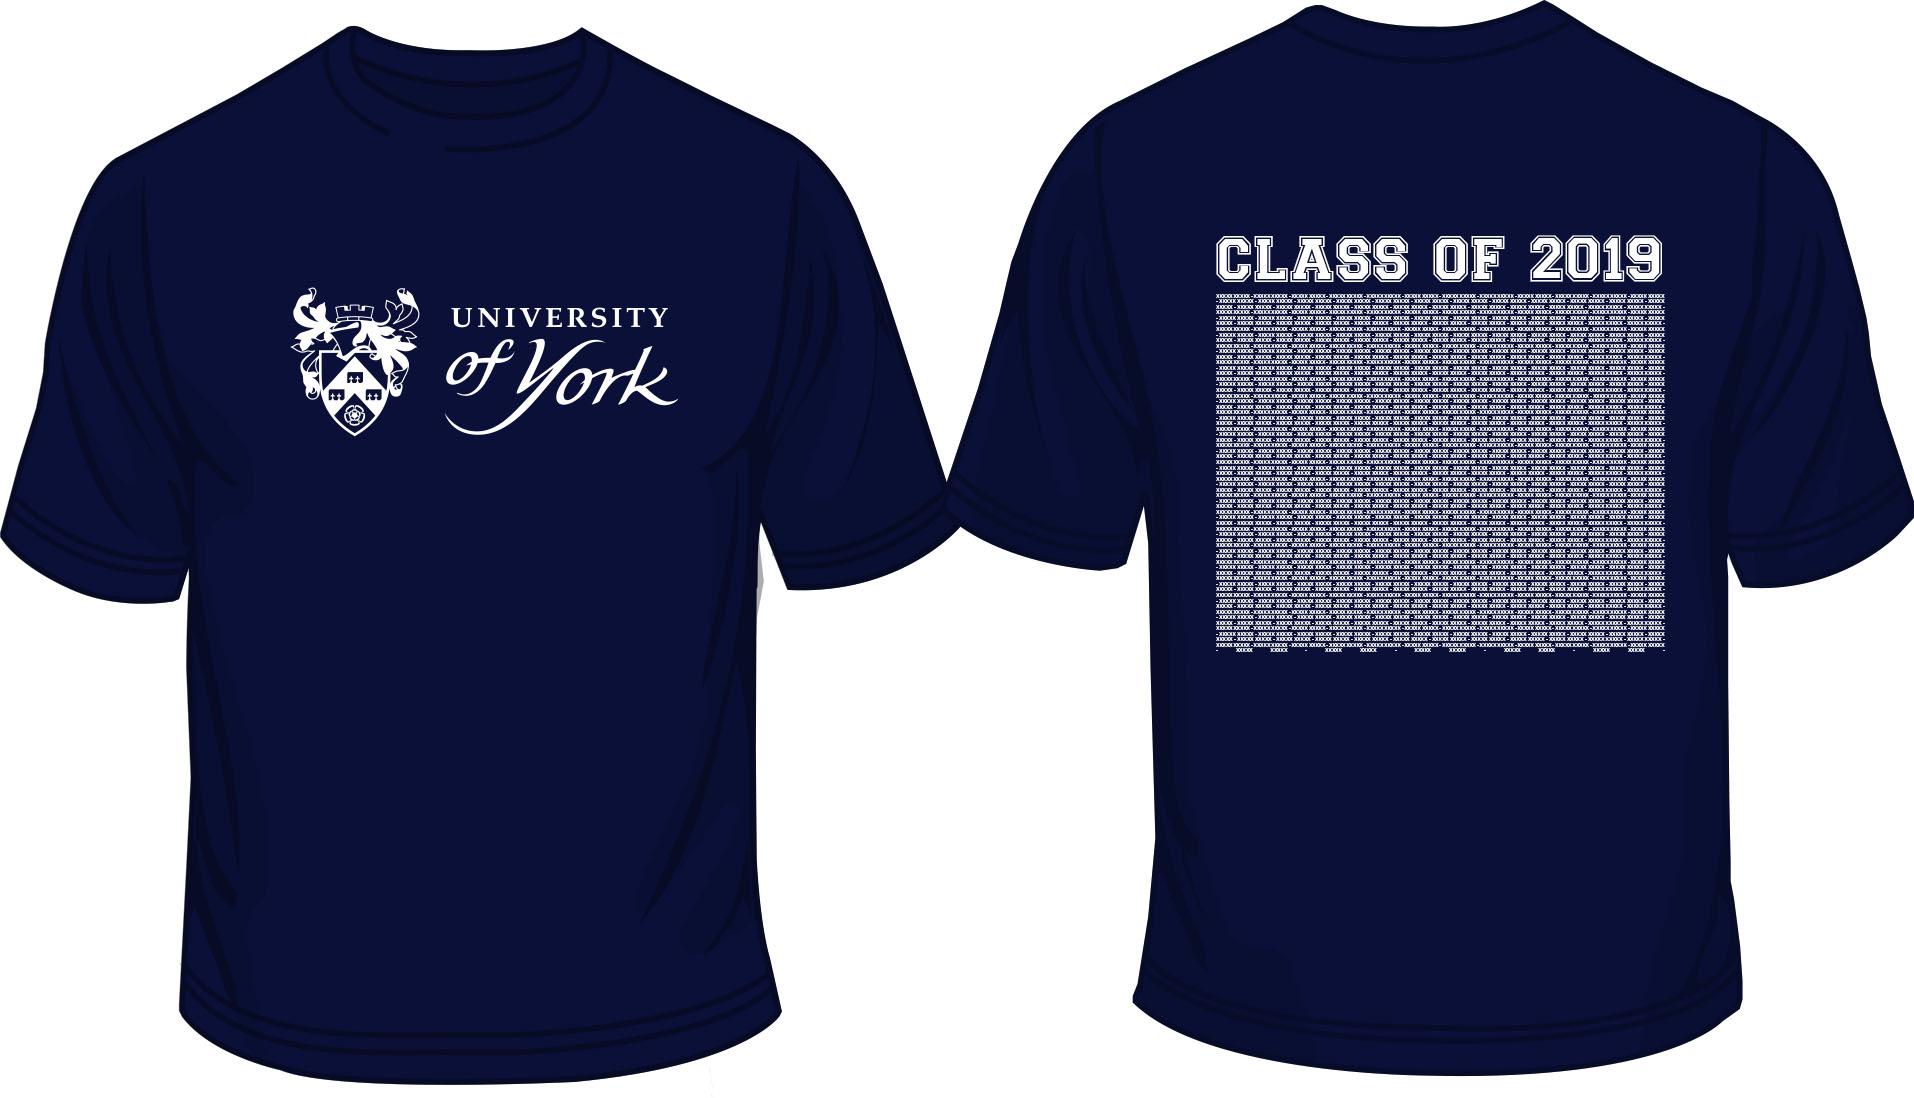 Graduation T-Shirt Friday 19th (Navy)